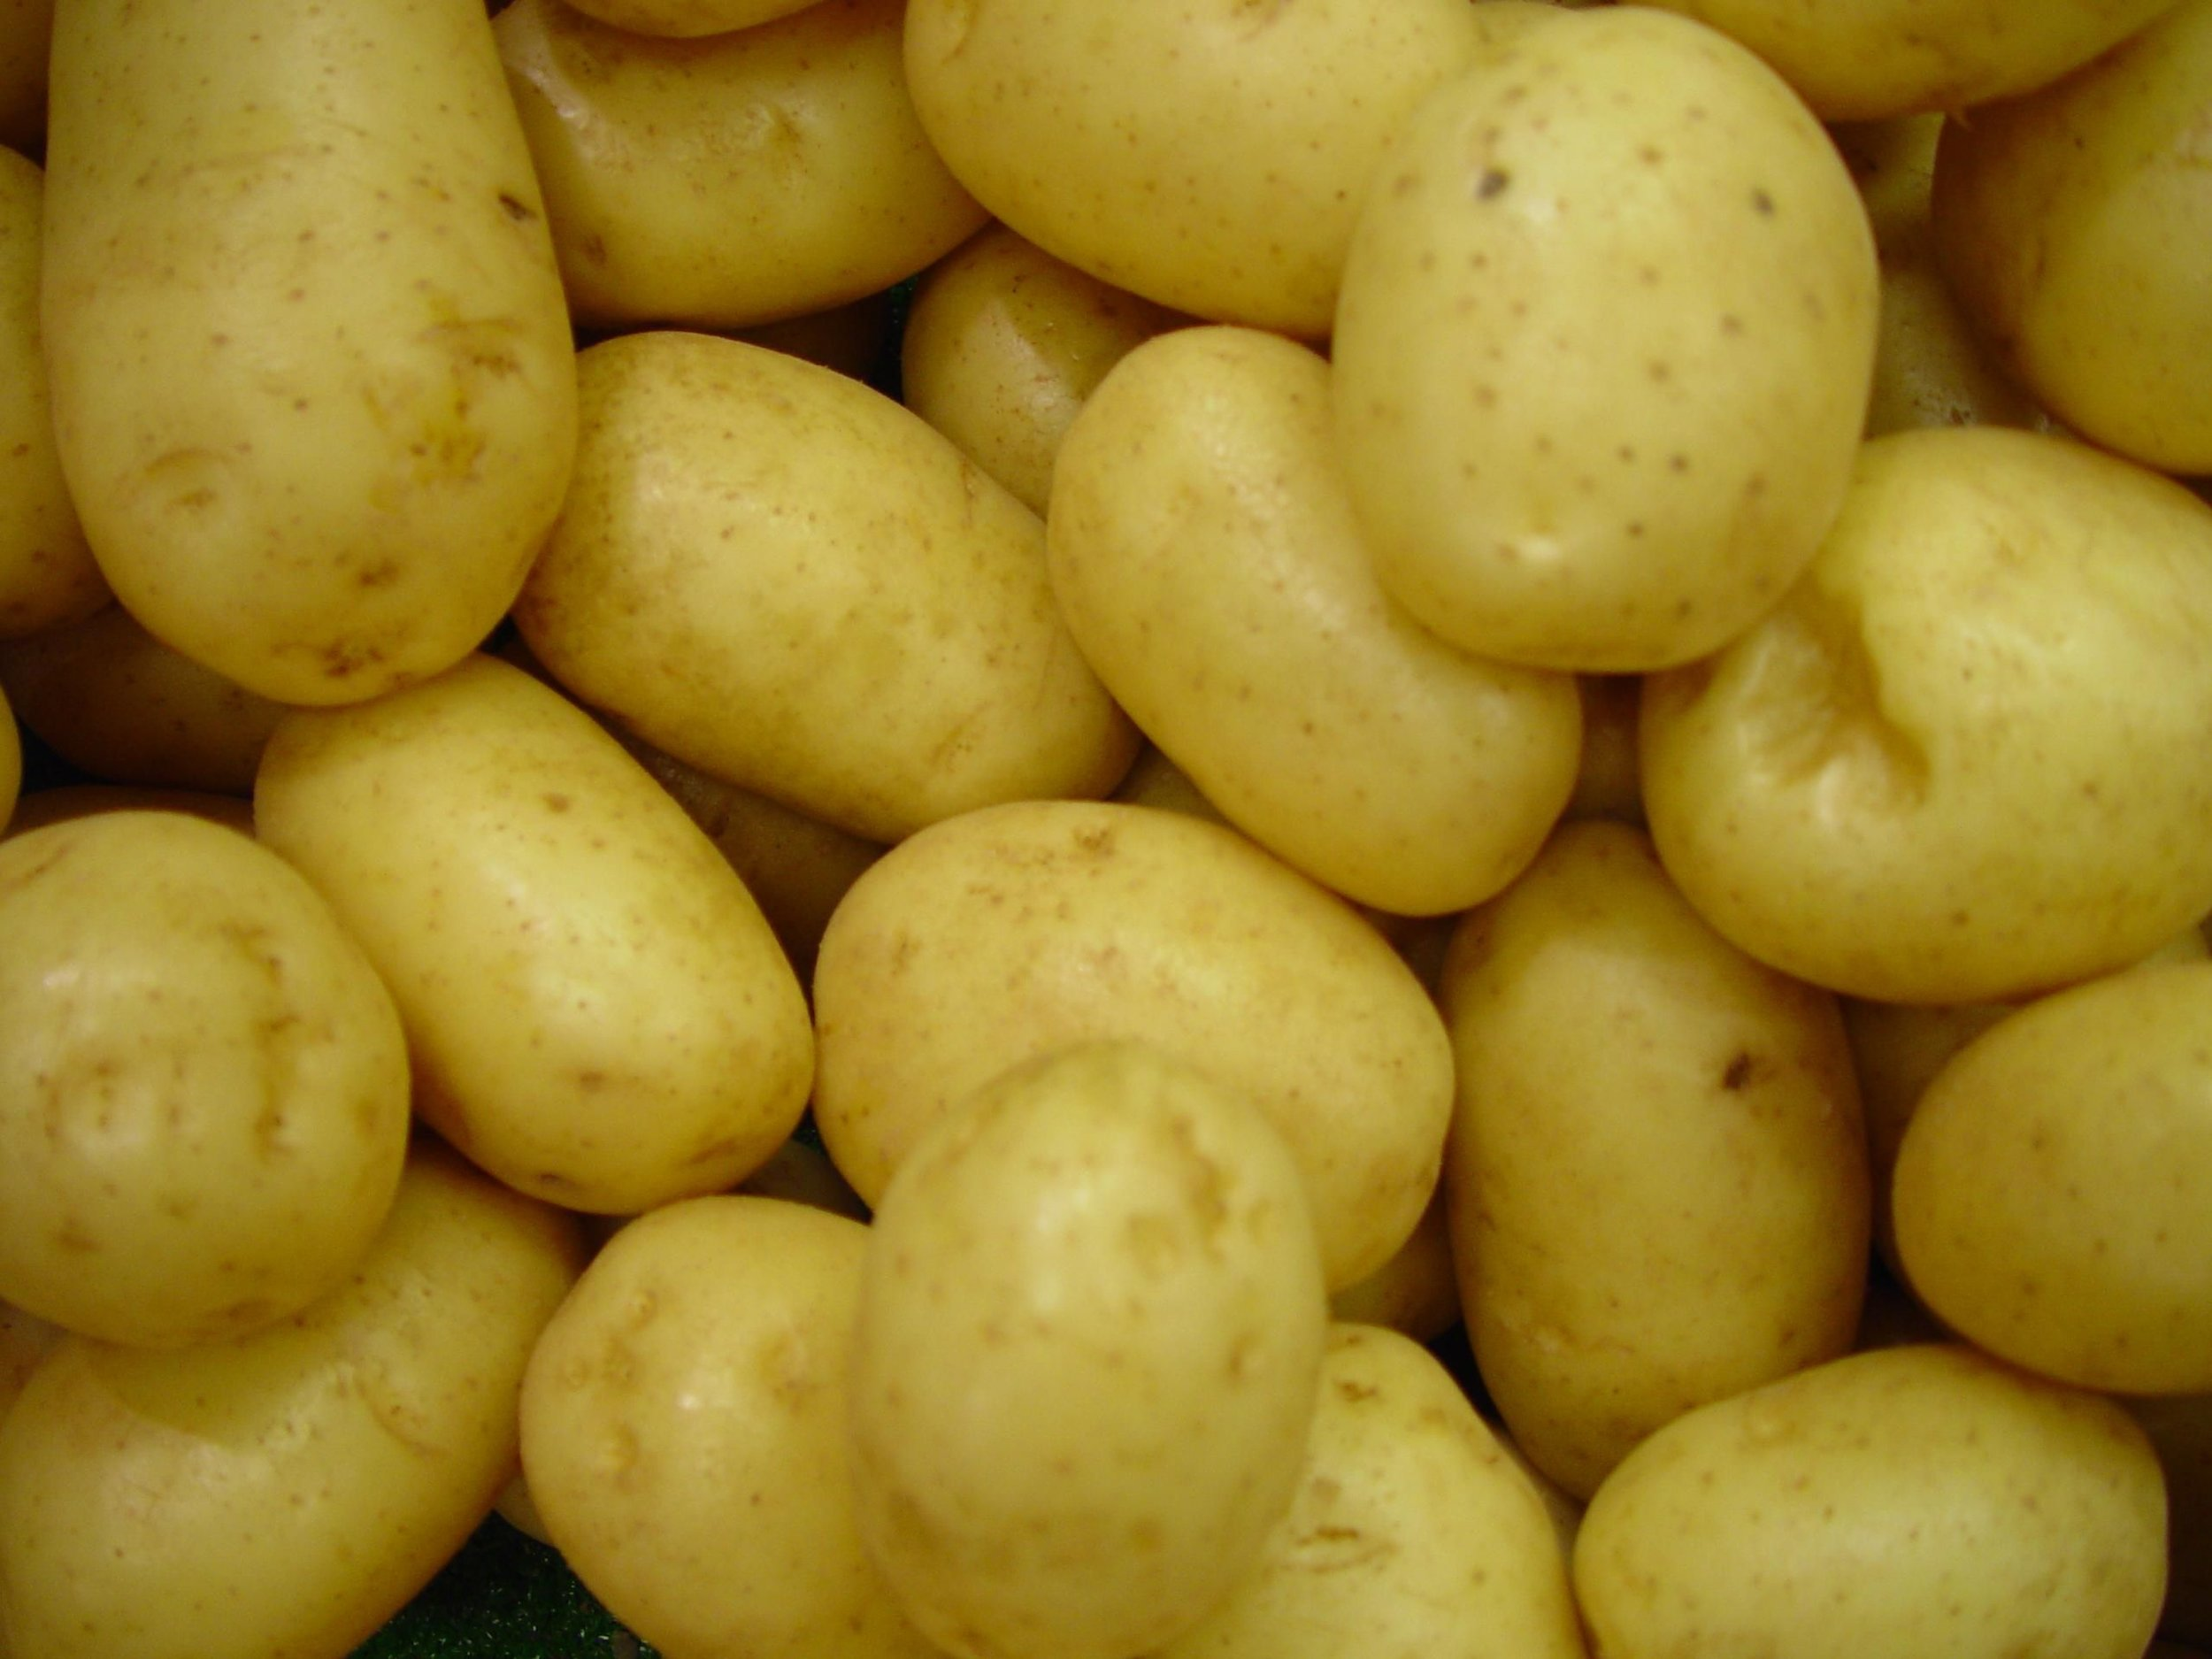 Potatoes - About potatoes, she once said,